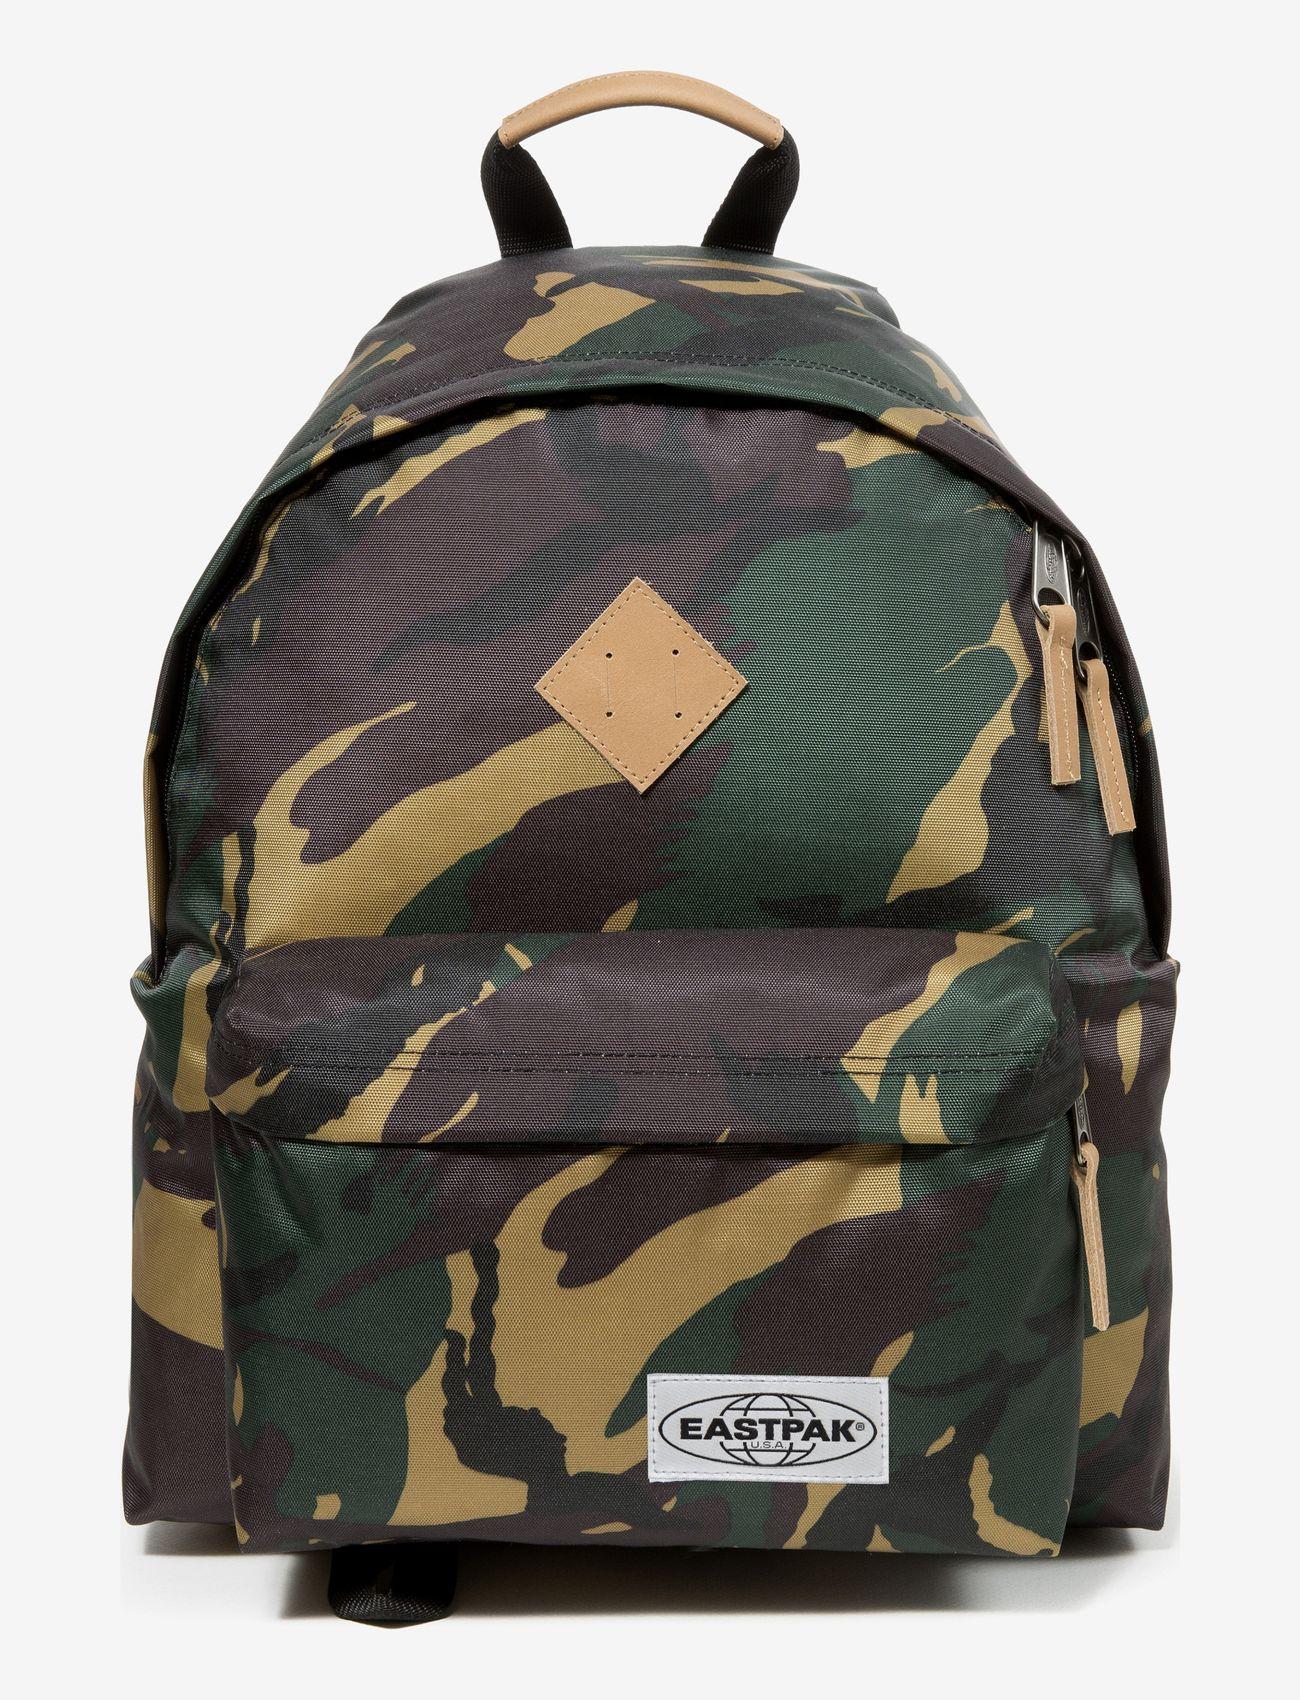 Eastpak - PADDED PAK'R - backpacks - into camo